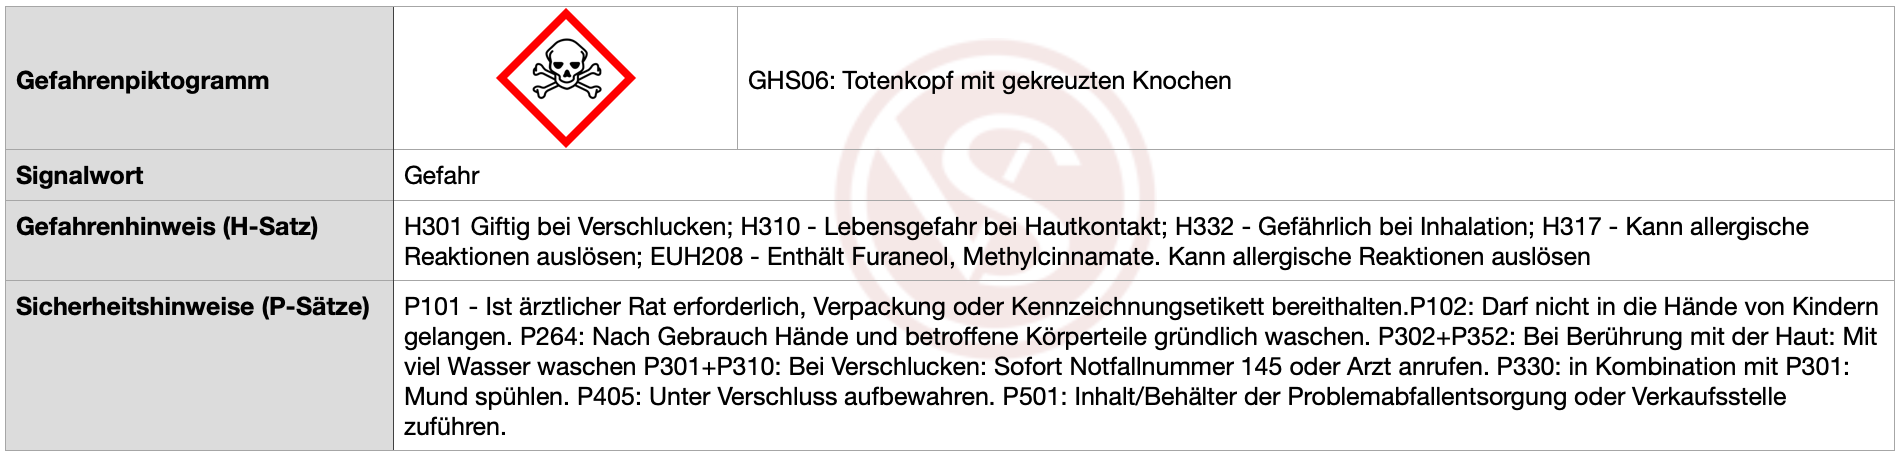 Gefahr_H301_H310_H332_H317_EUH_Furaneol_Methylcinnamate